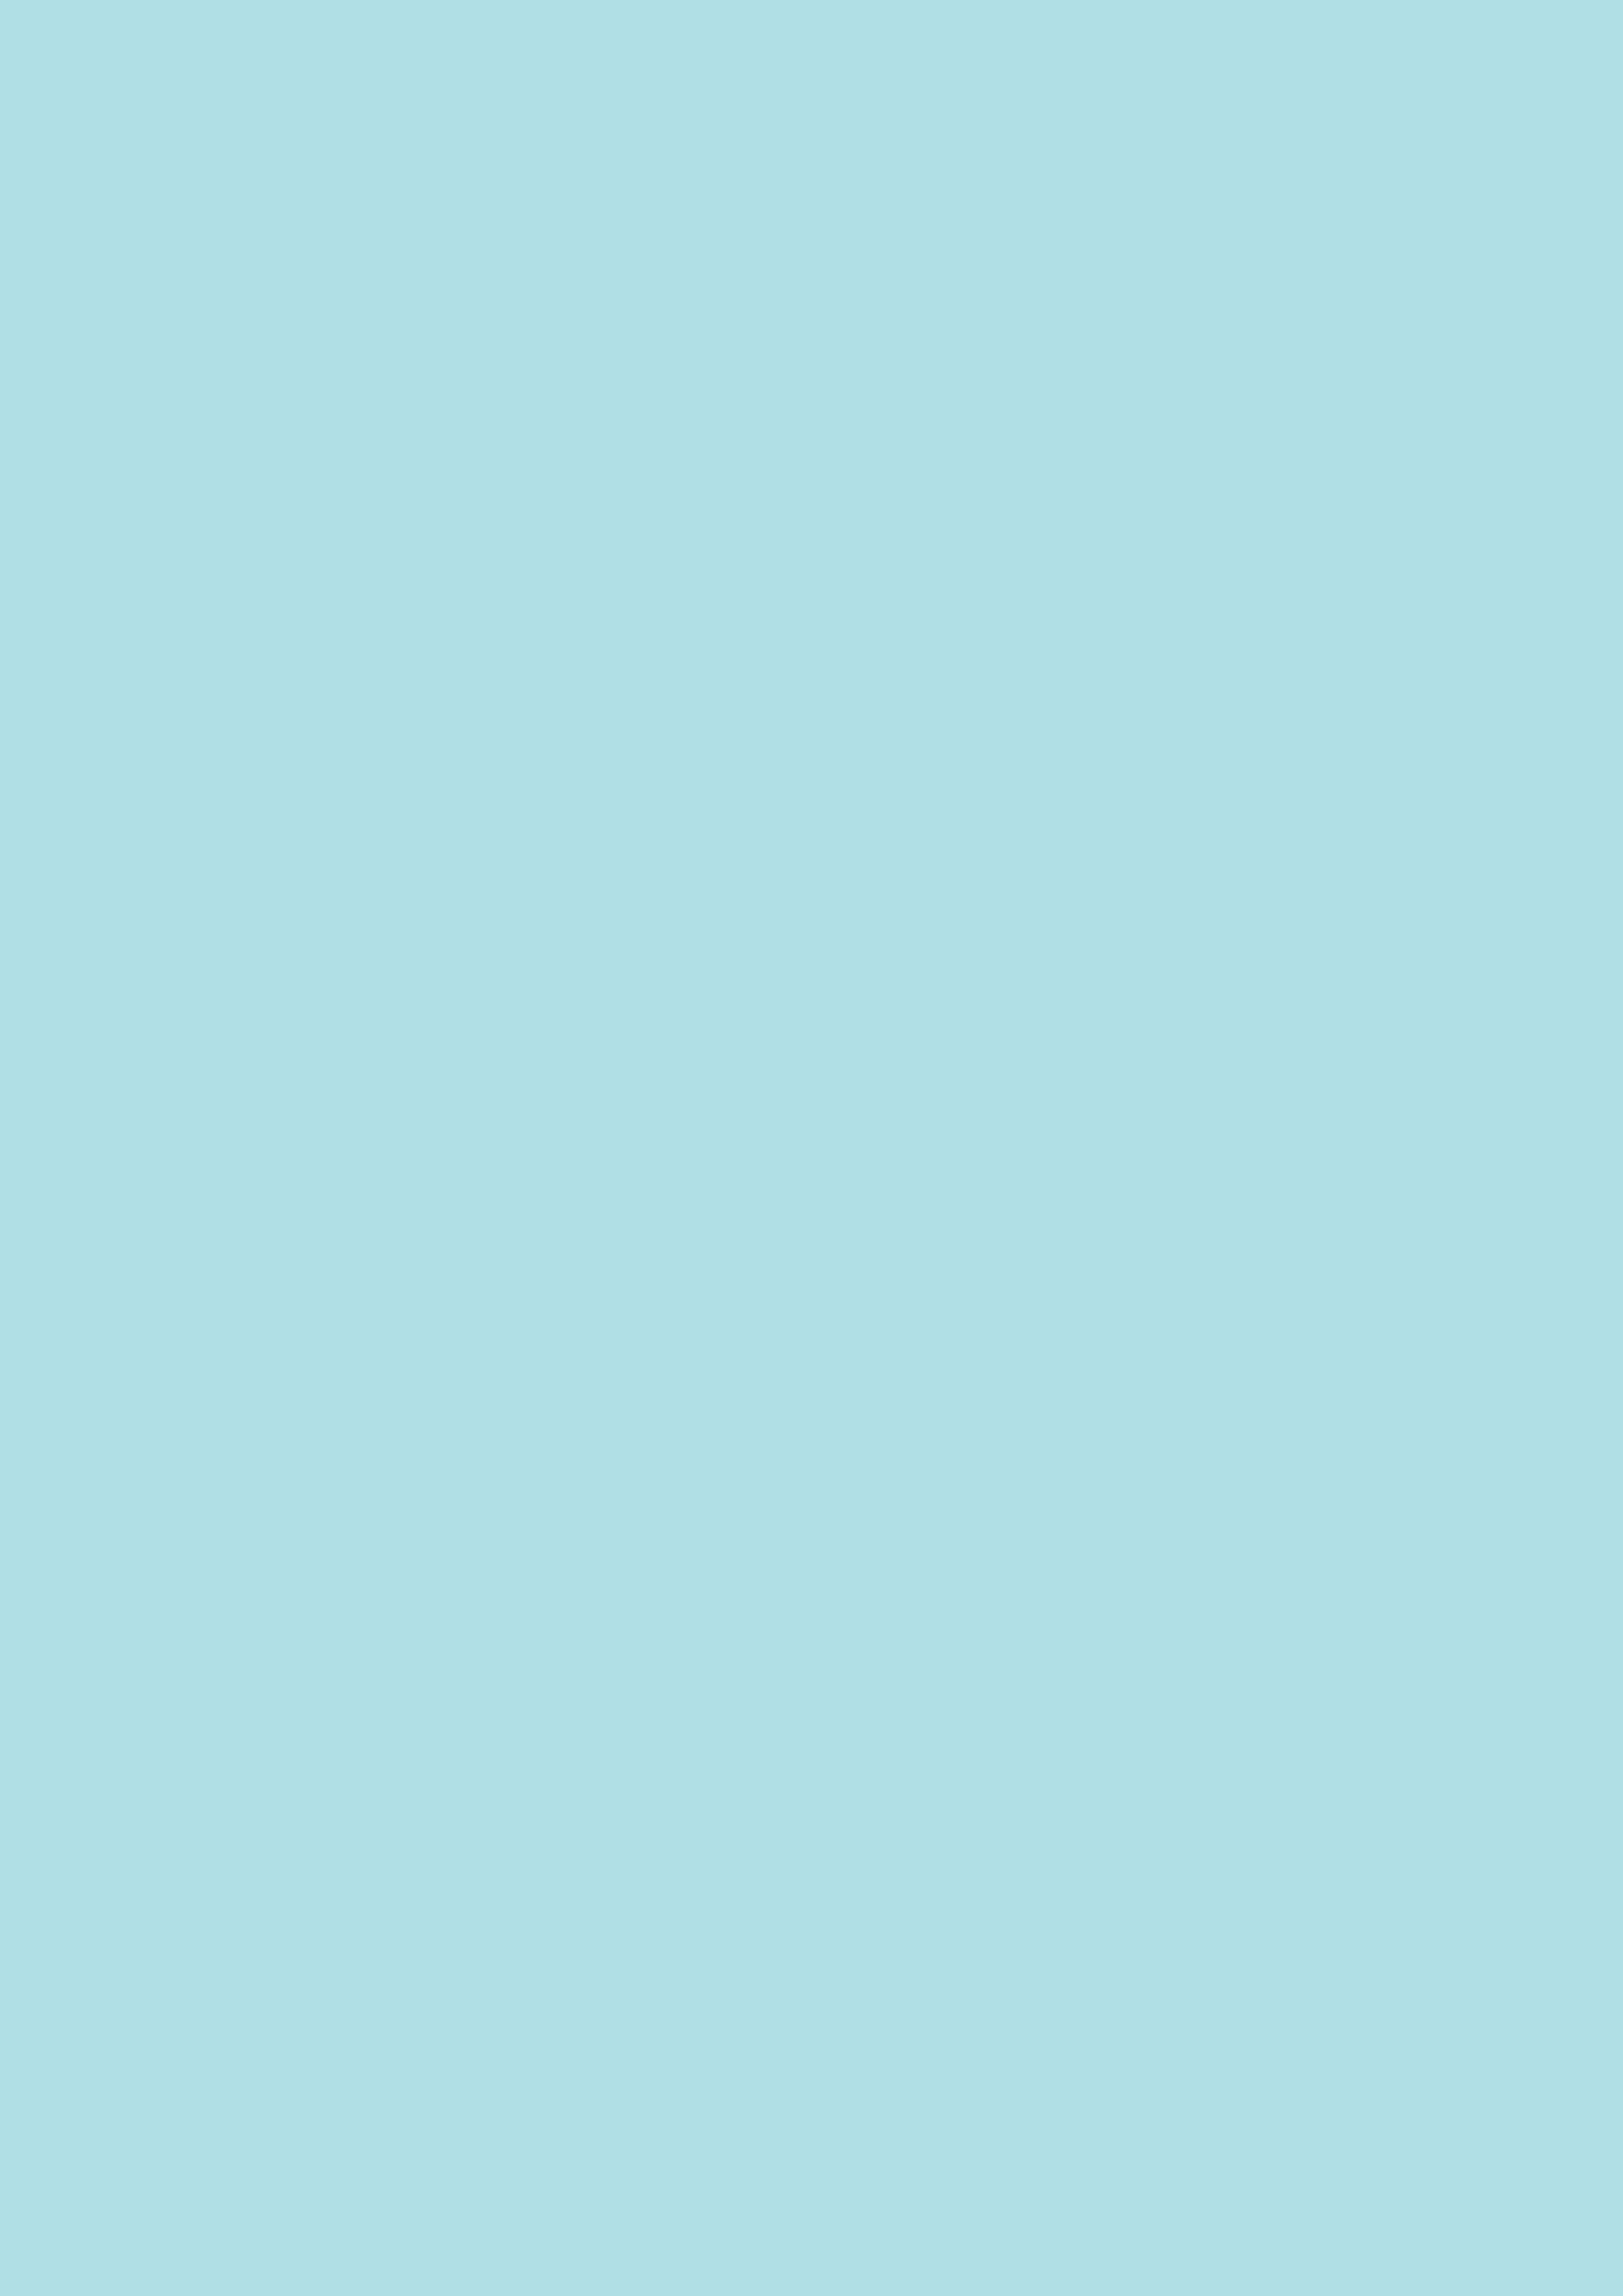 2480x3508 Powder Blue Web Solid Color Background